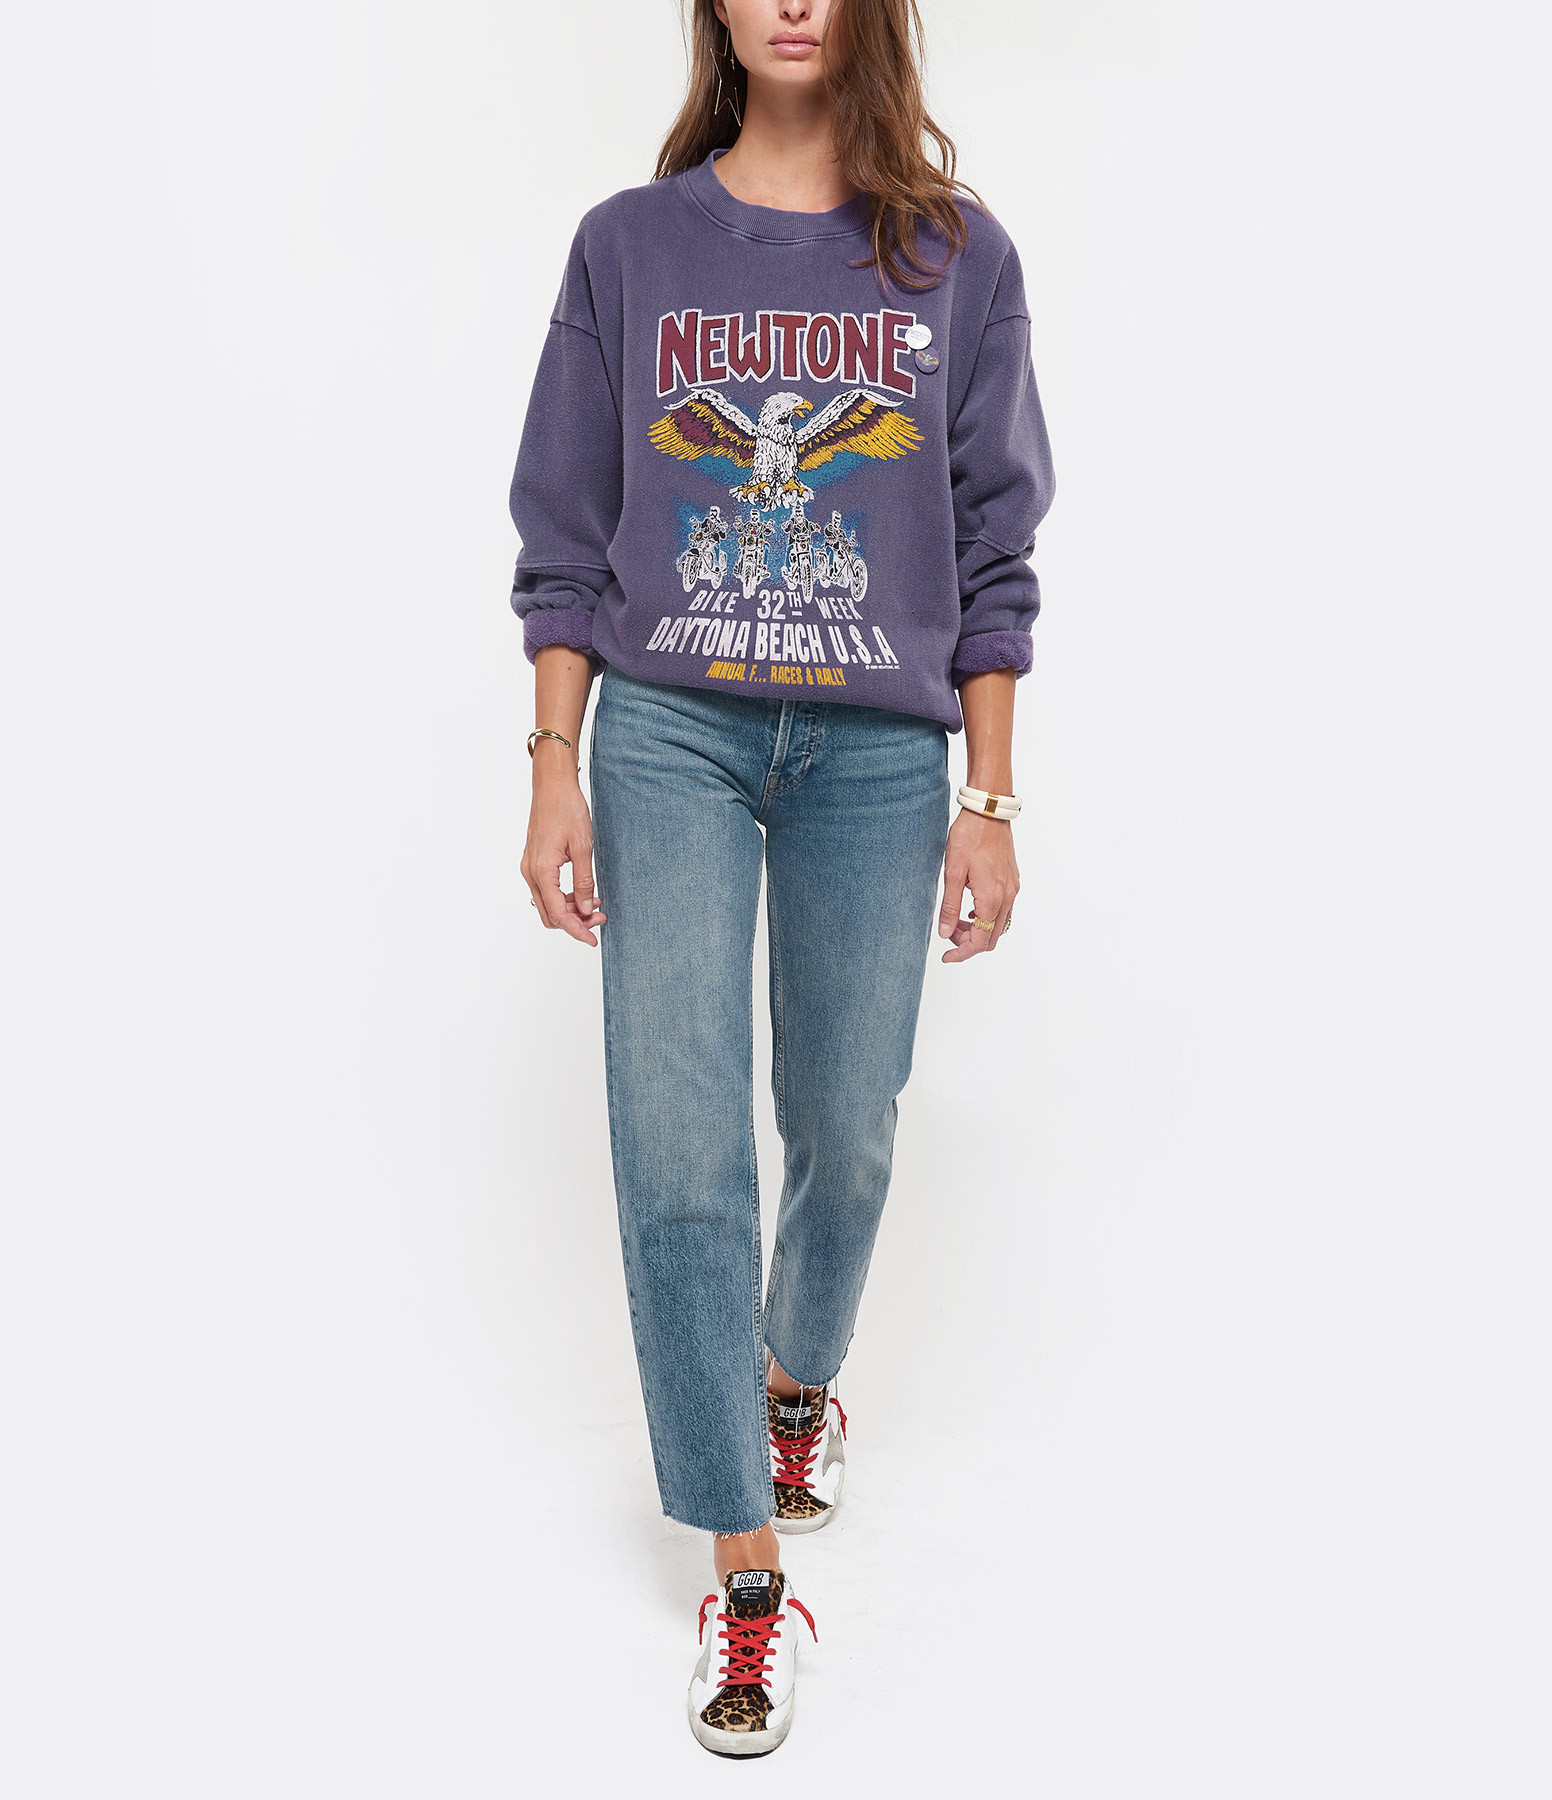 NEWTONE - Sweatshirt Roller Convention Coton Violet Grappe